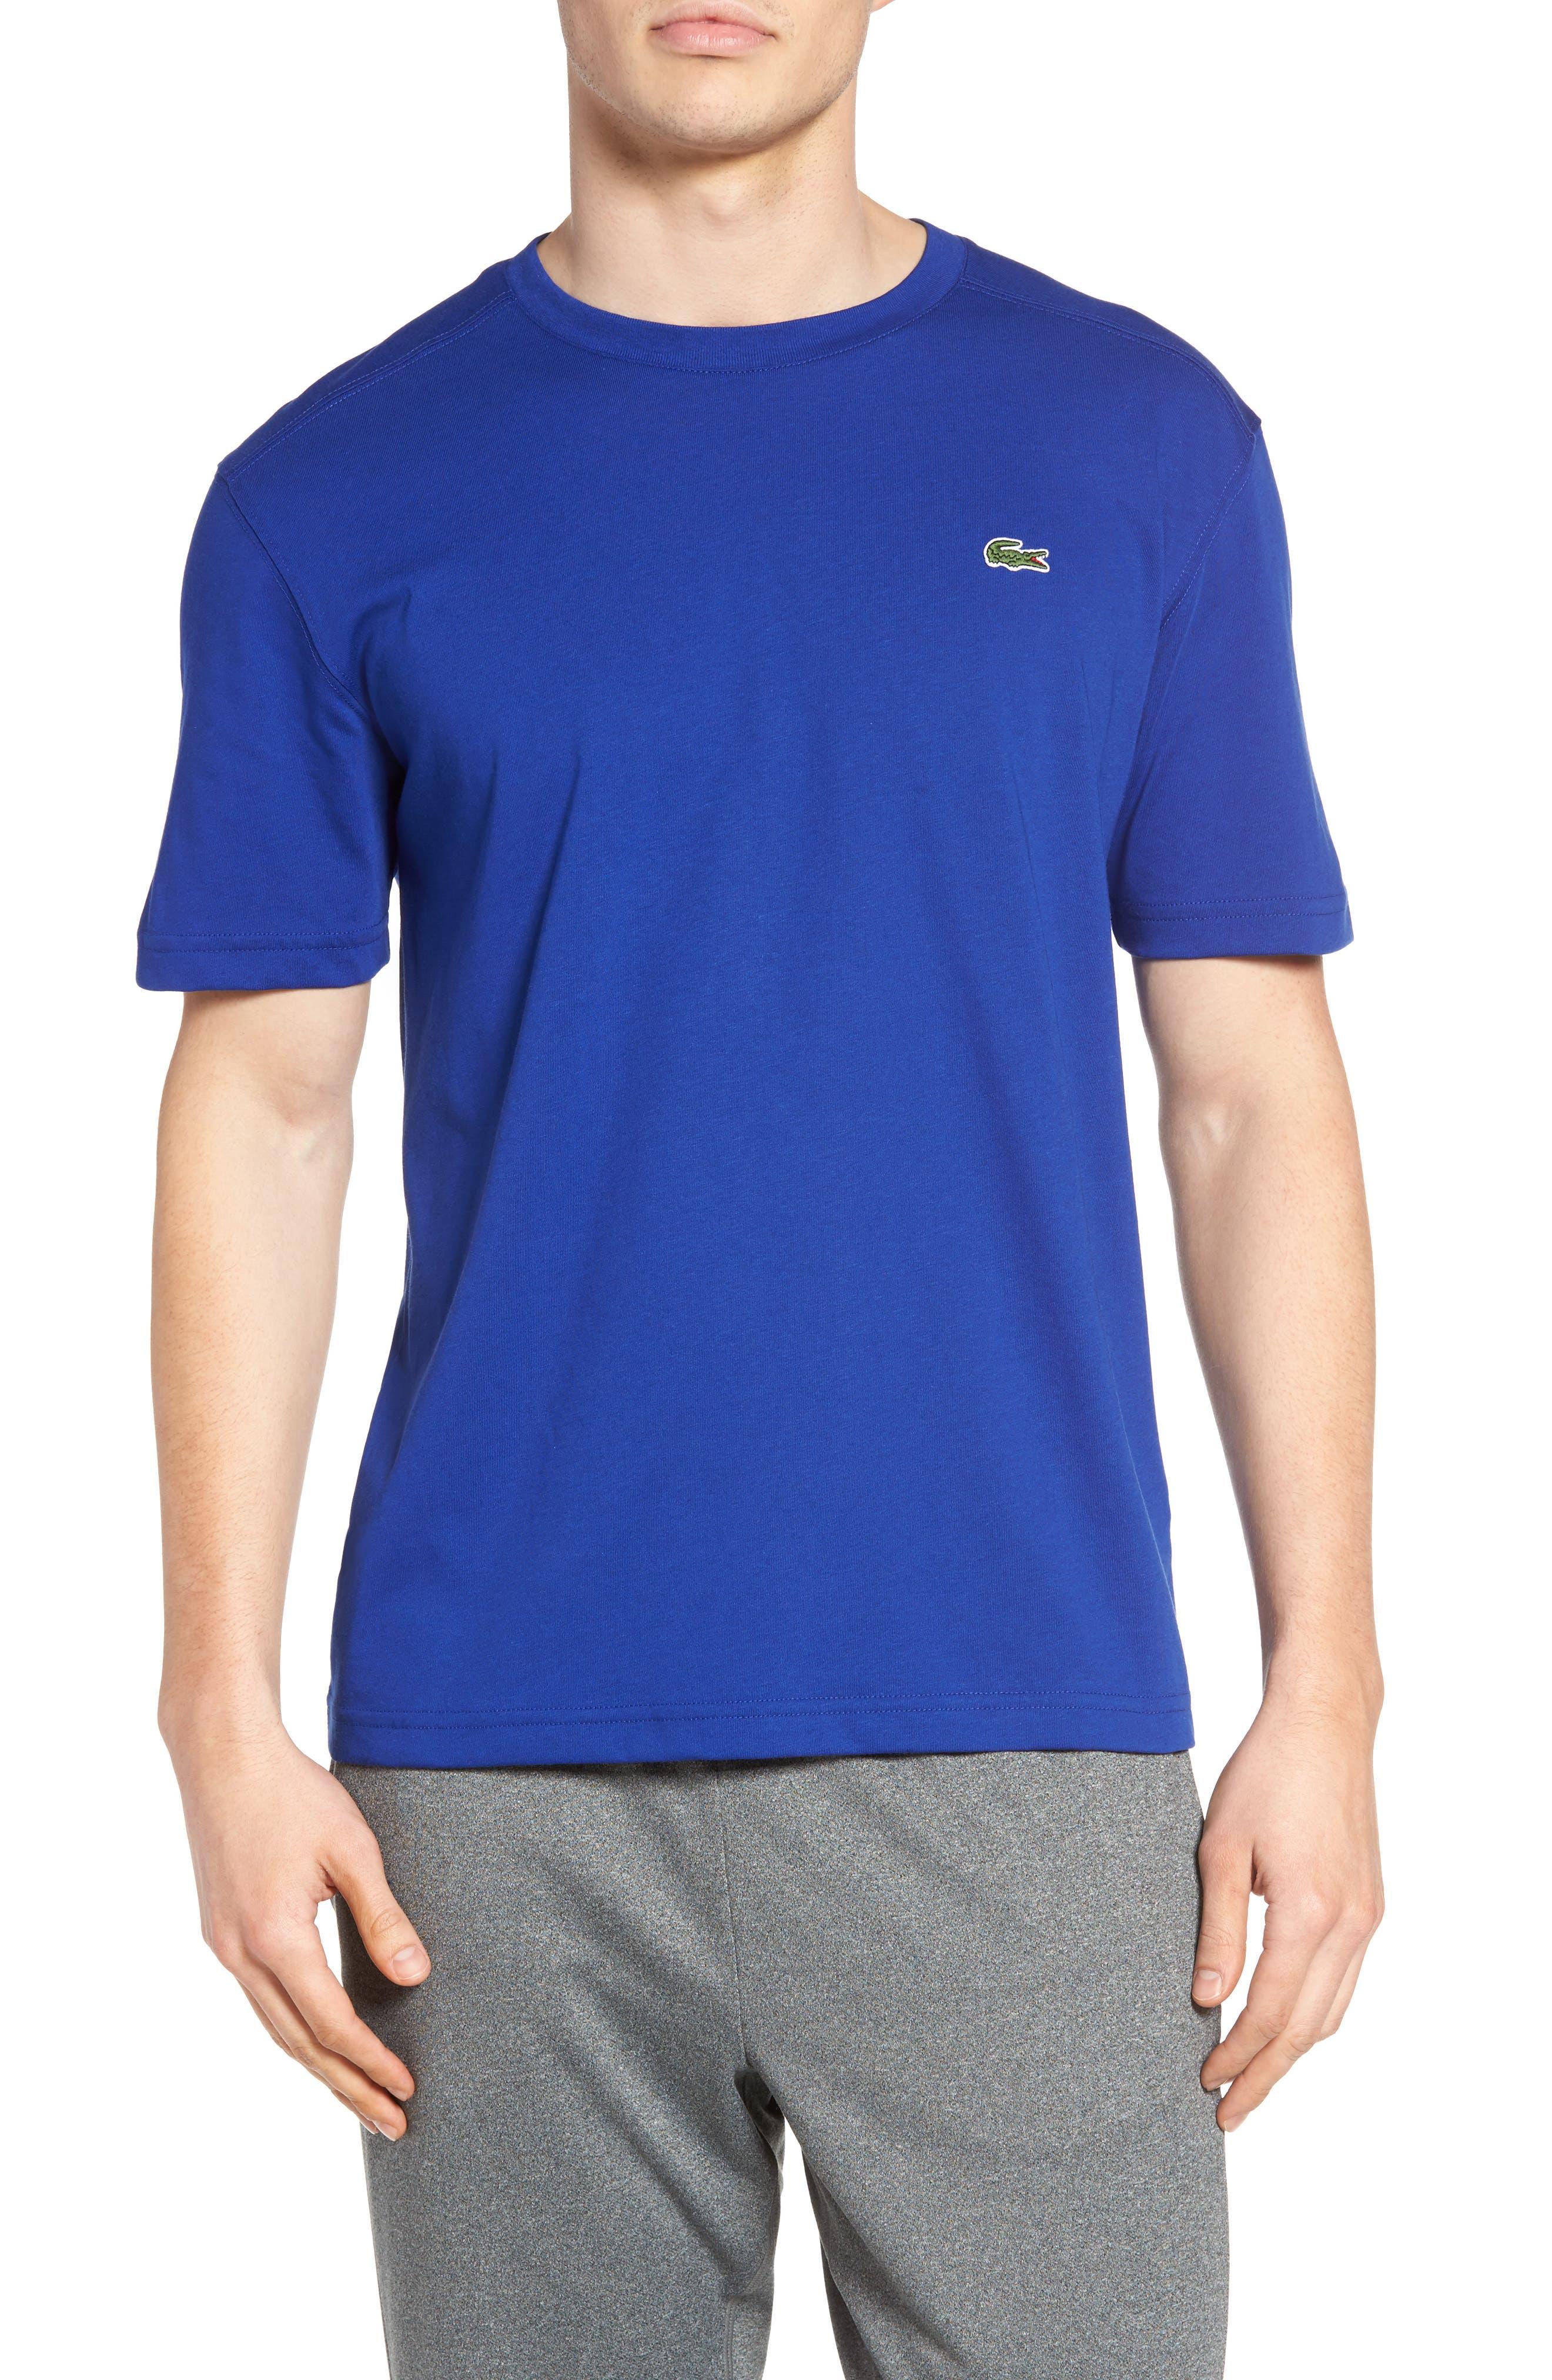 Main Image - Lacoste'Sport' Cotton Jersey T-Shirt